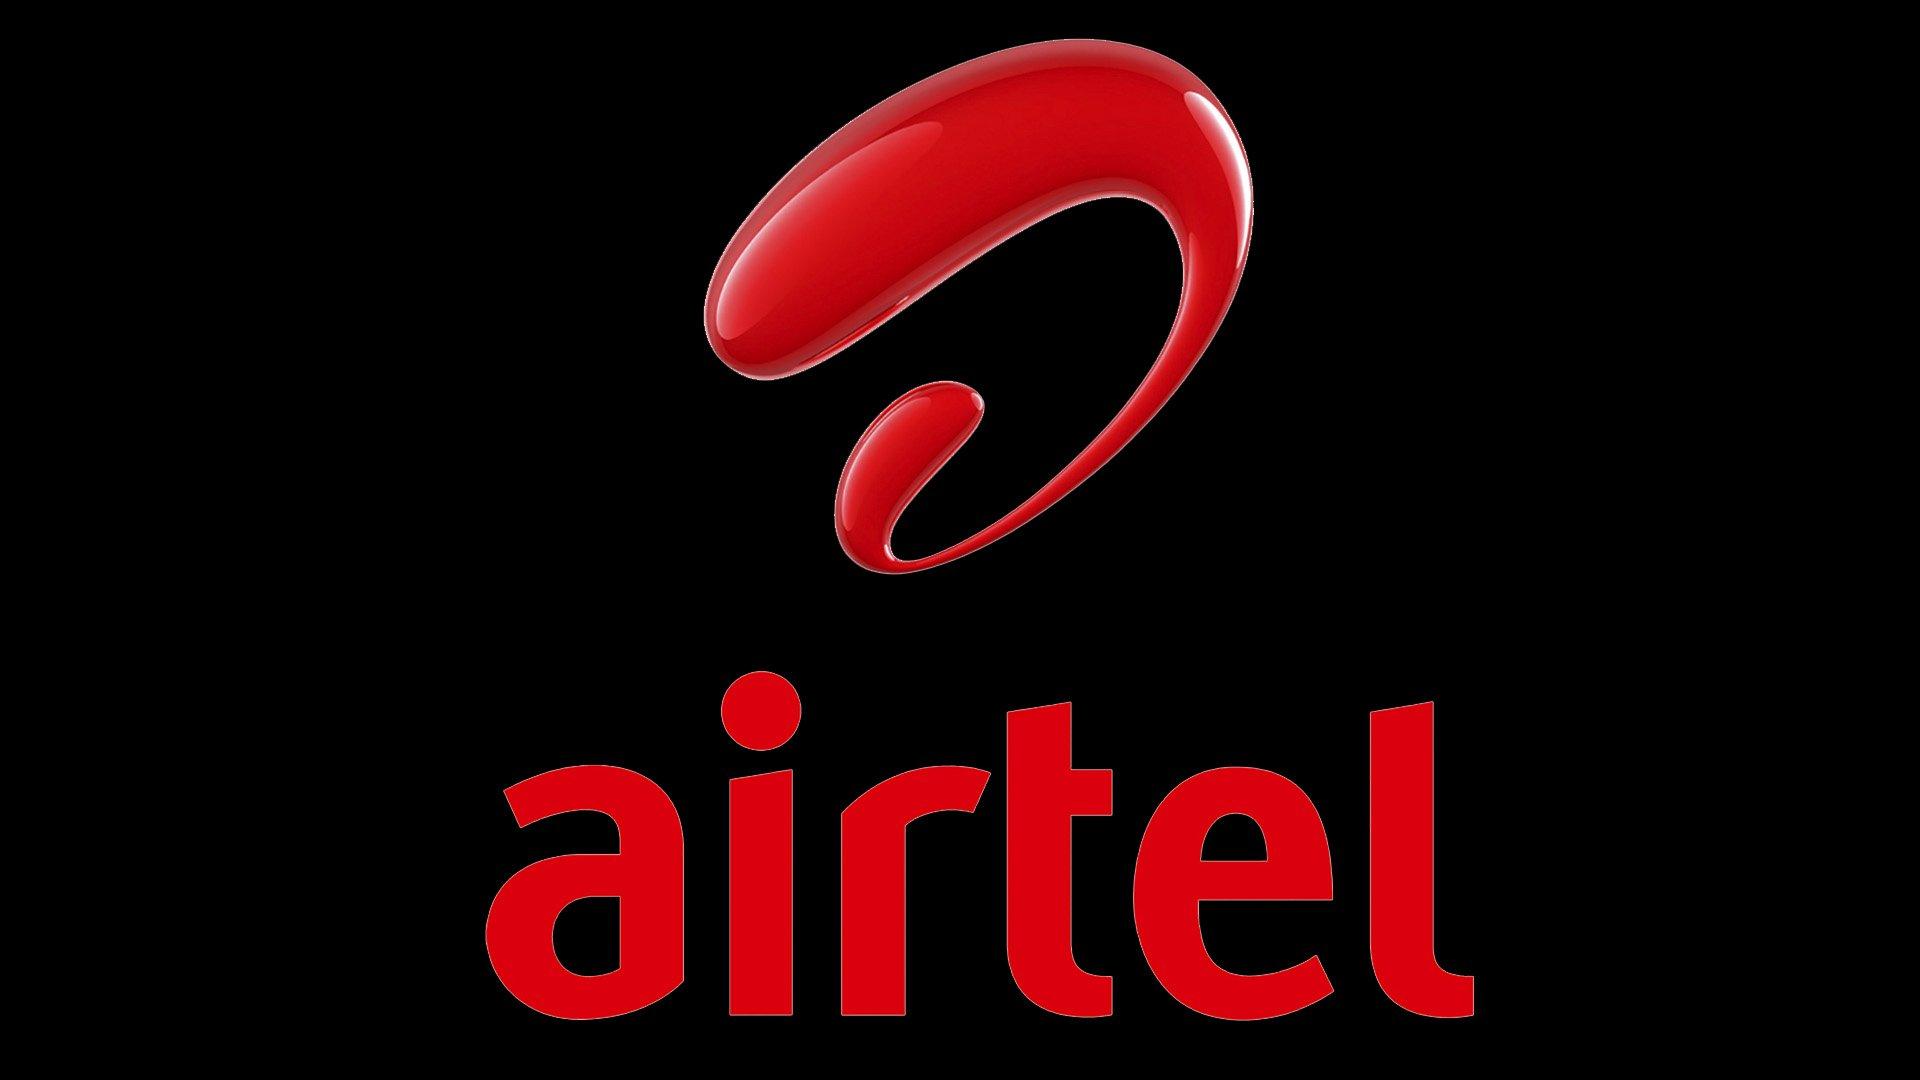 Airtel Black Logo